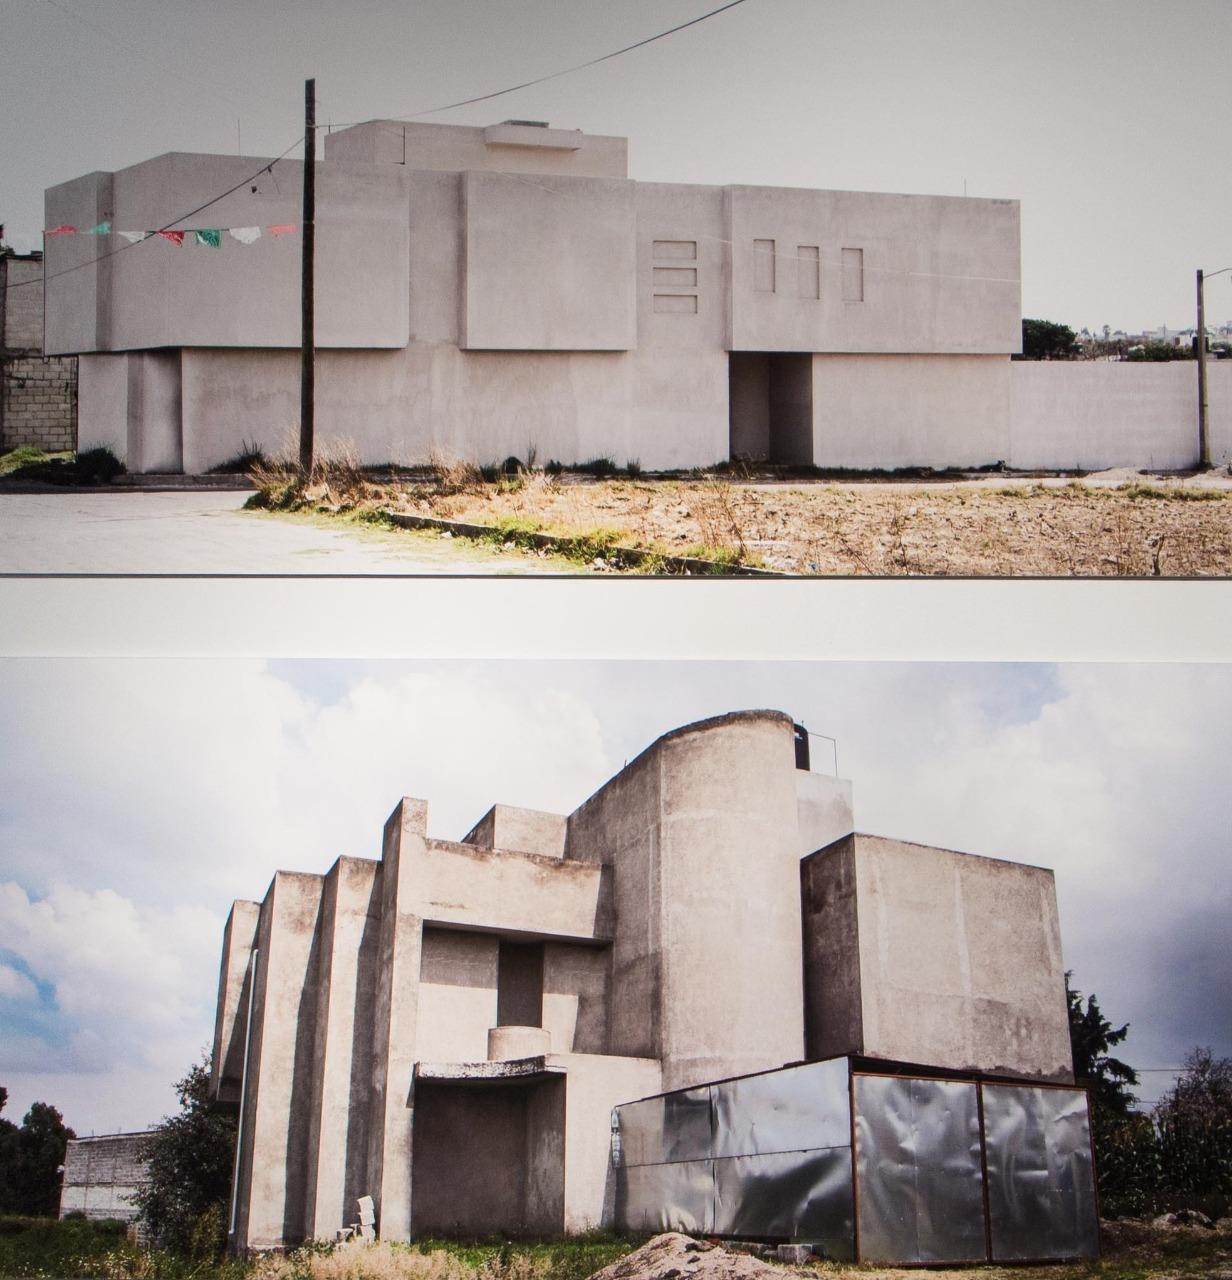 Bunker, Karla Hamilton, 2018. Fotografia, 60 x 60 x 2 cm, fotografias sobre pvc.